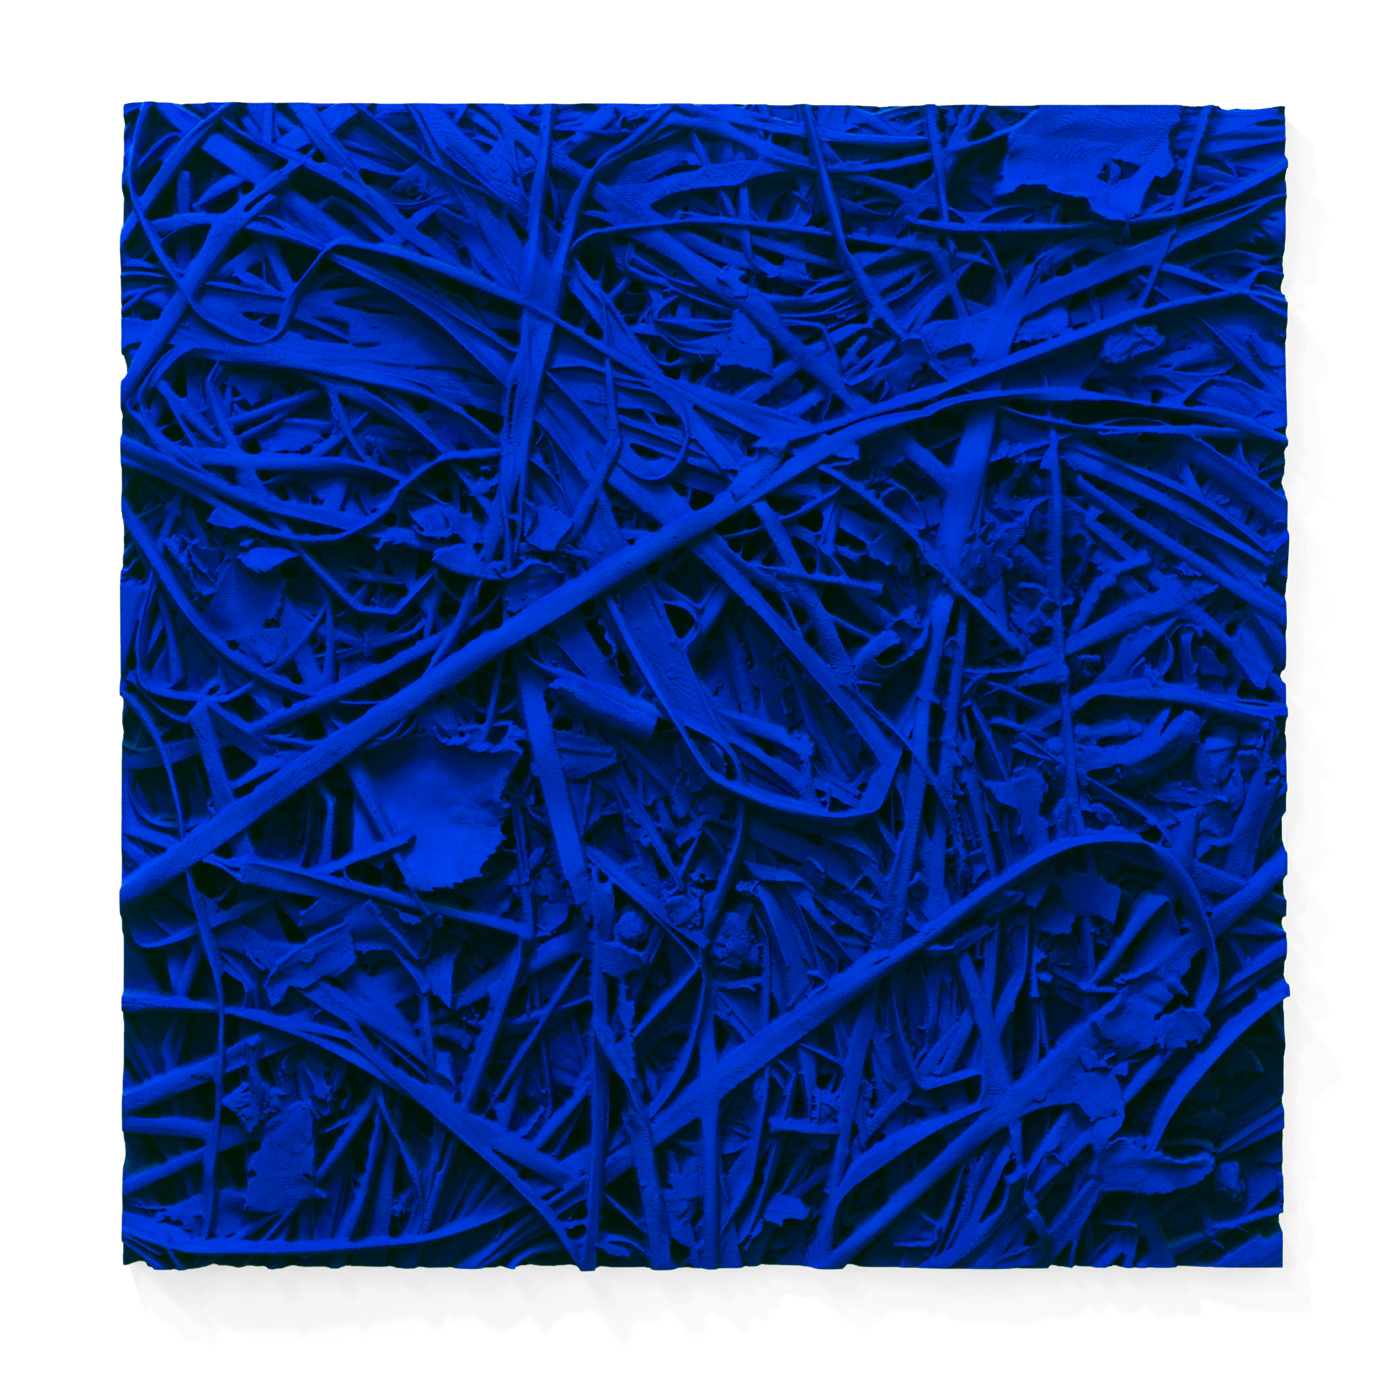 Juri Markkula IKB Grass 100x100cm pigmented polyvinyl, polyurethan 2015